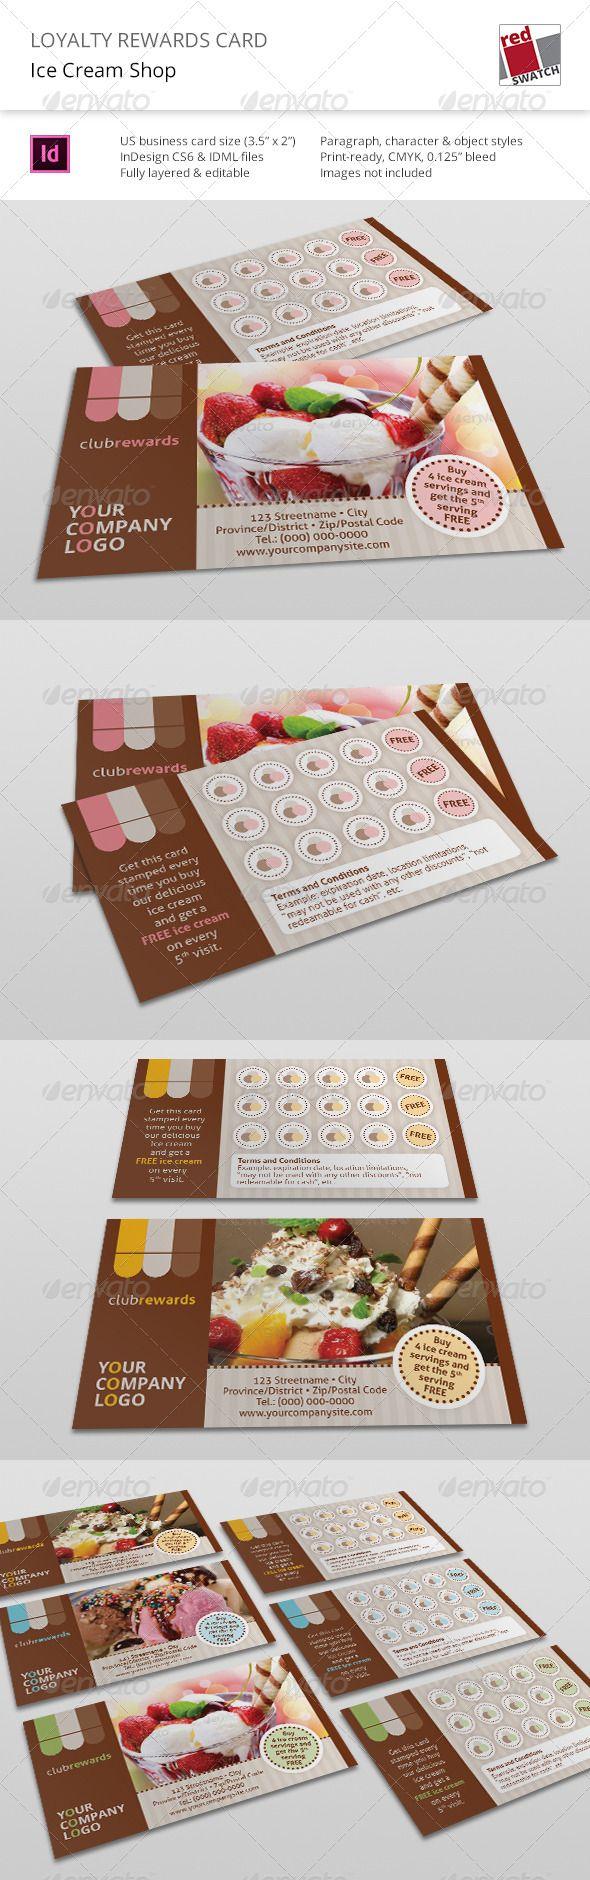 Loyalty Rewards Card - Ice Cream Shop Template #design #printdesign Download: http://graphicriver.net/item/loyalty-rewards-card-ice-cream-shop/6498561?ref=ksioks